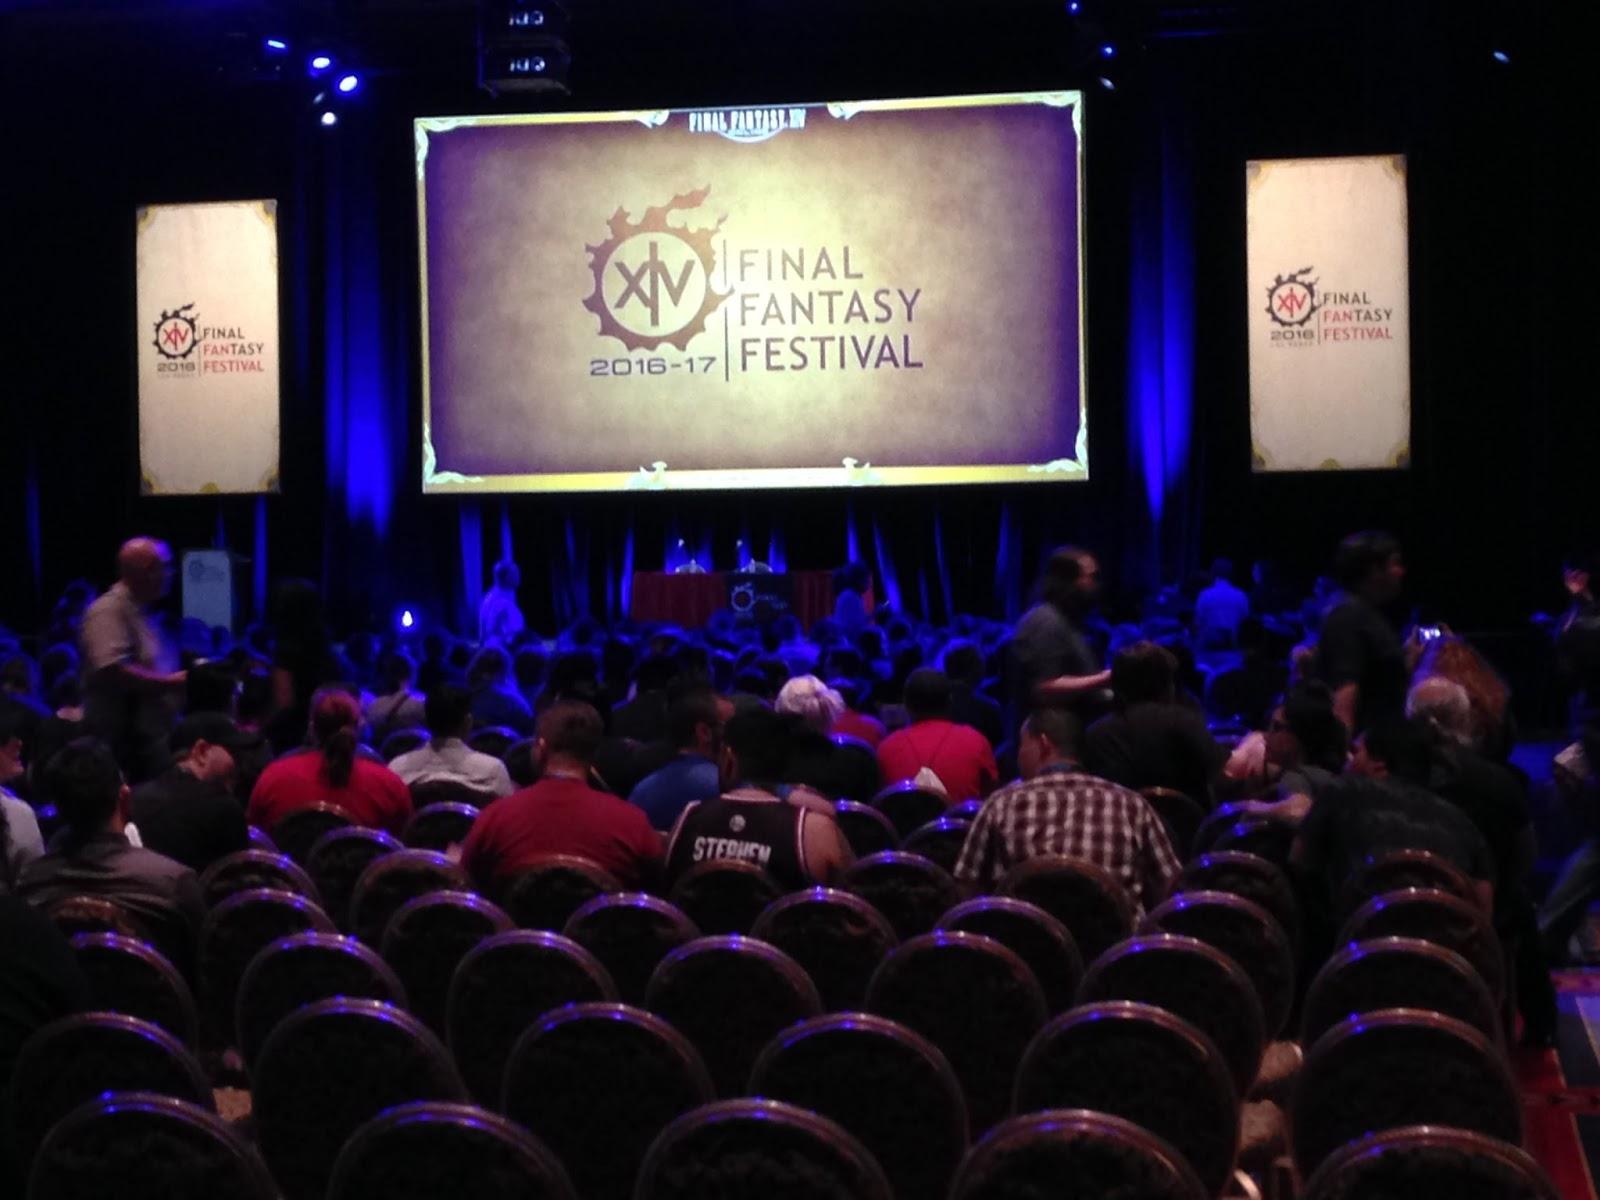 Talk Star Wars To Me: Final Fantasy XIV FanFest 2016 - A